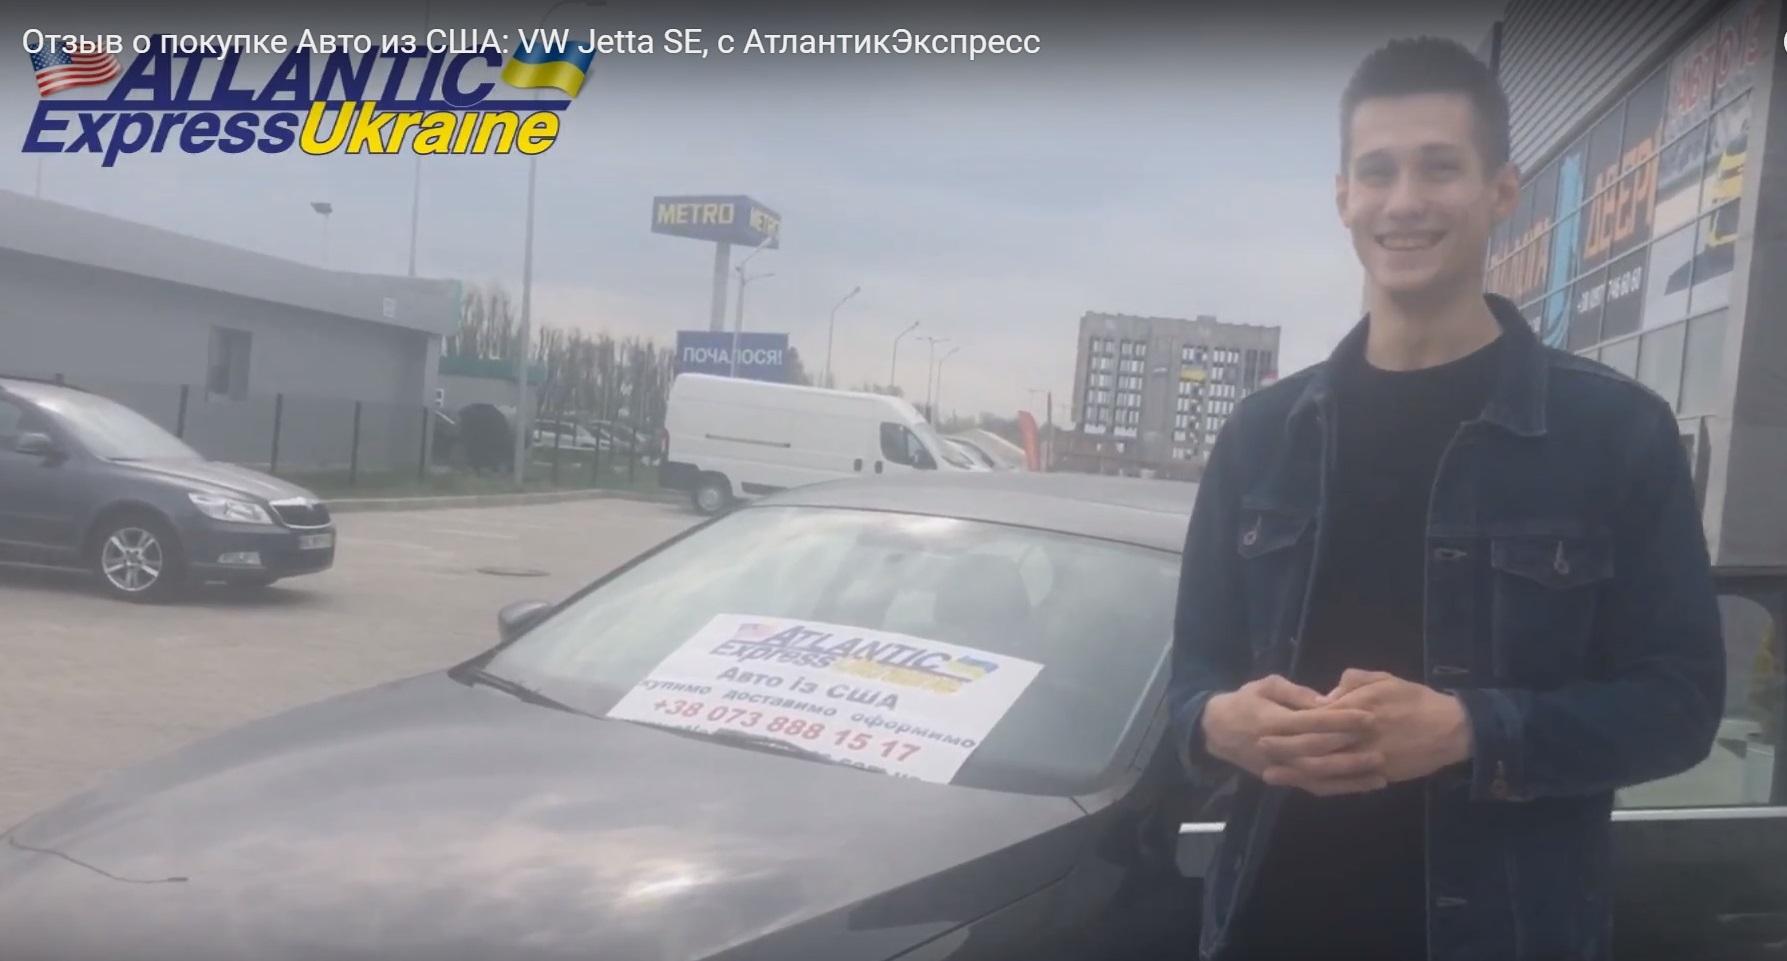 VW Jetta SE, из США (Видео)